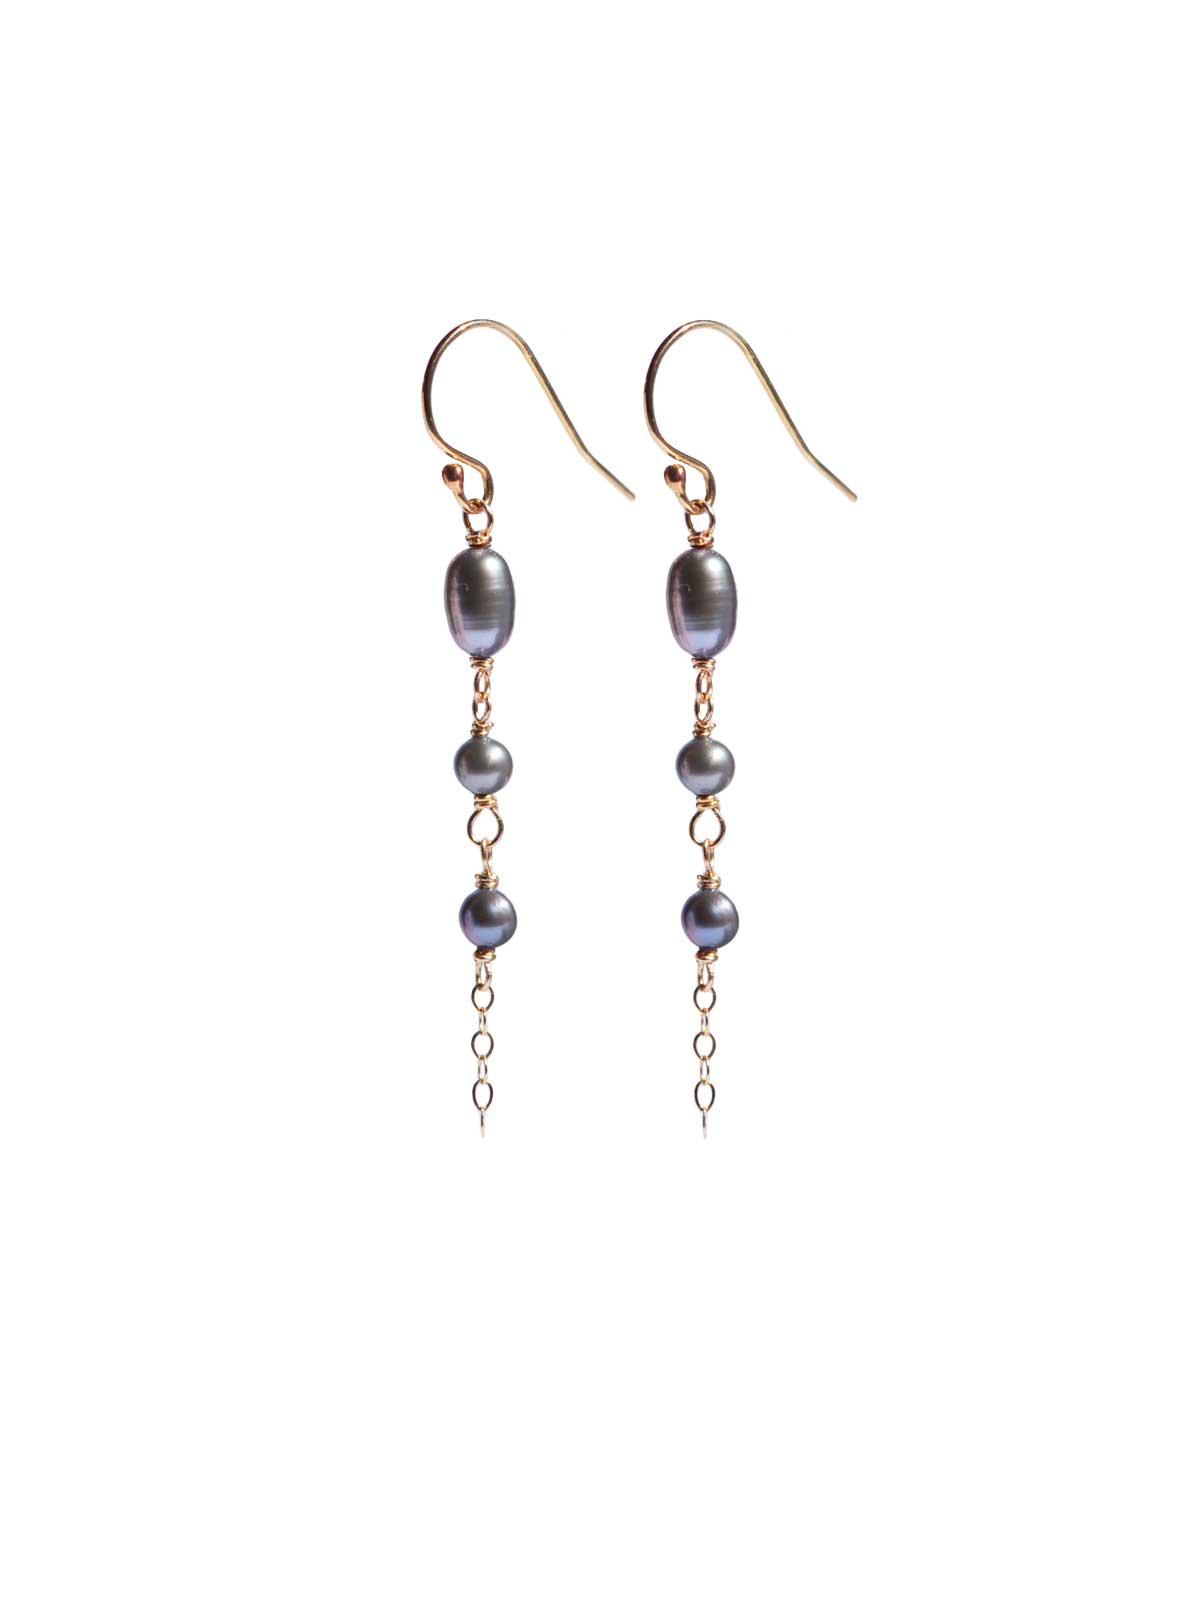 Earrings 14K Gold-filled gray Freshwater Pearls